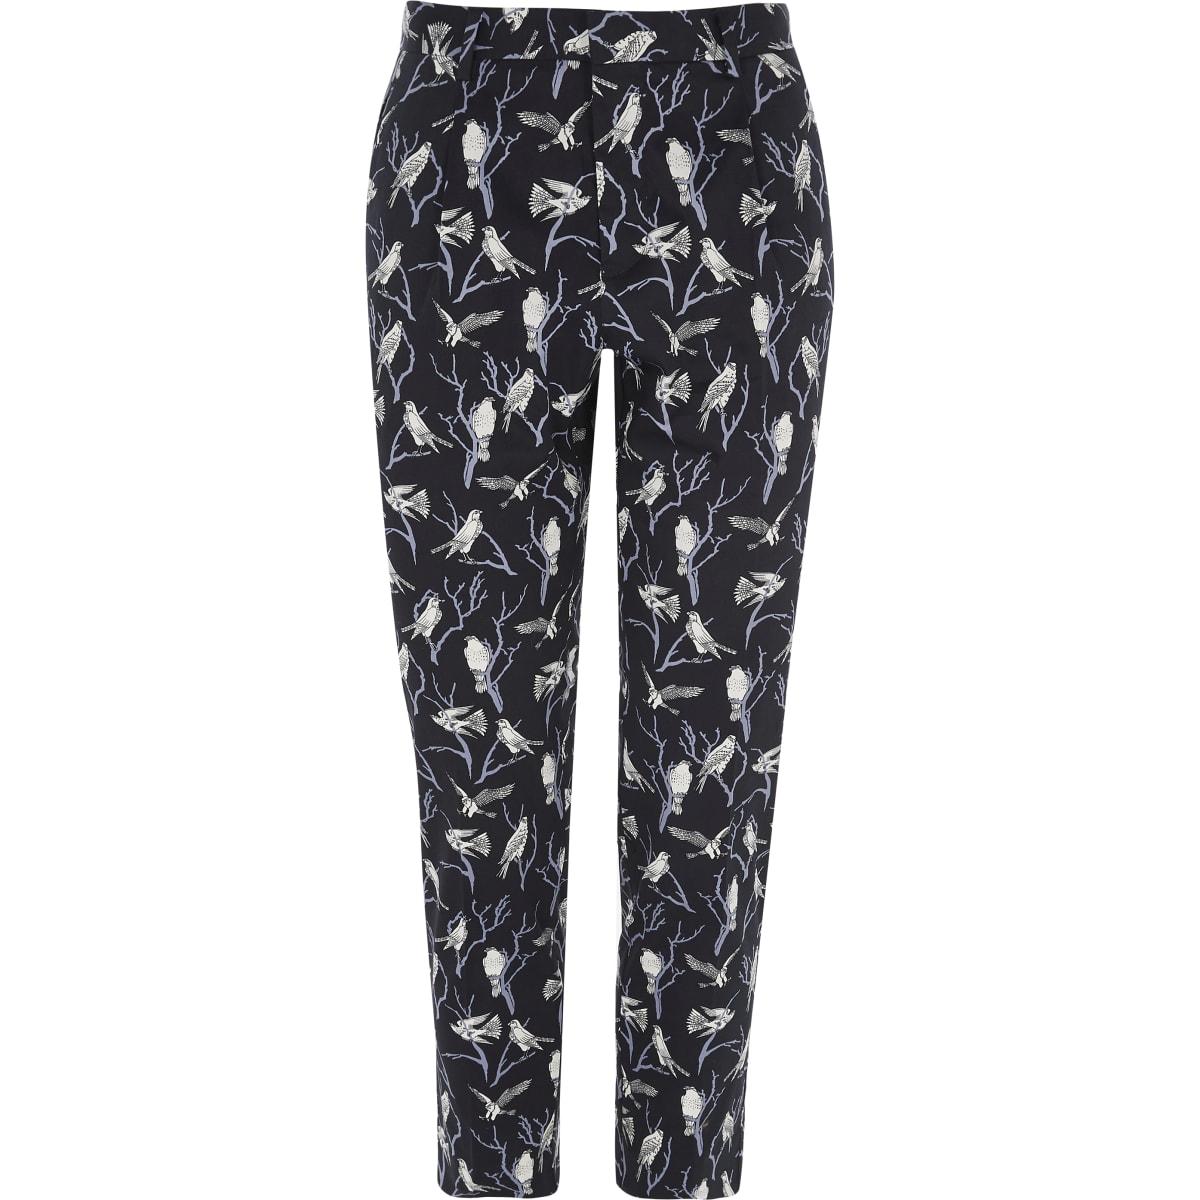 Jack & Jones Premium navy bird print pants